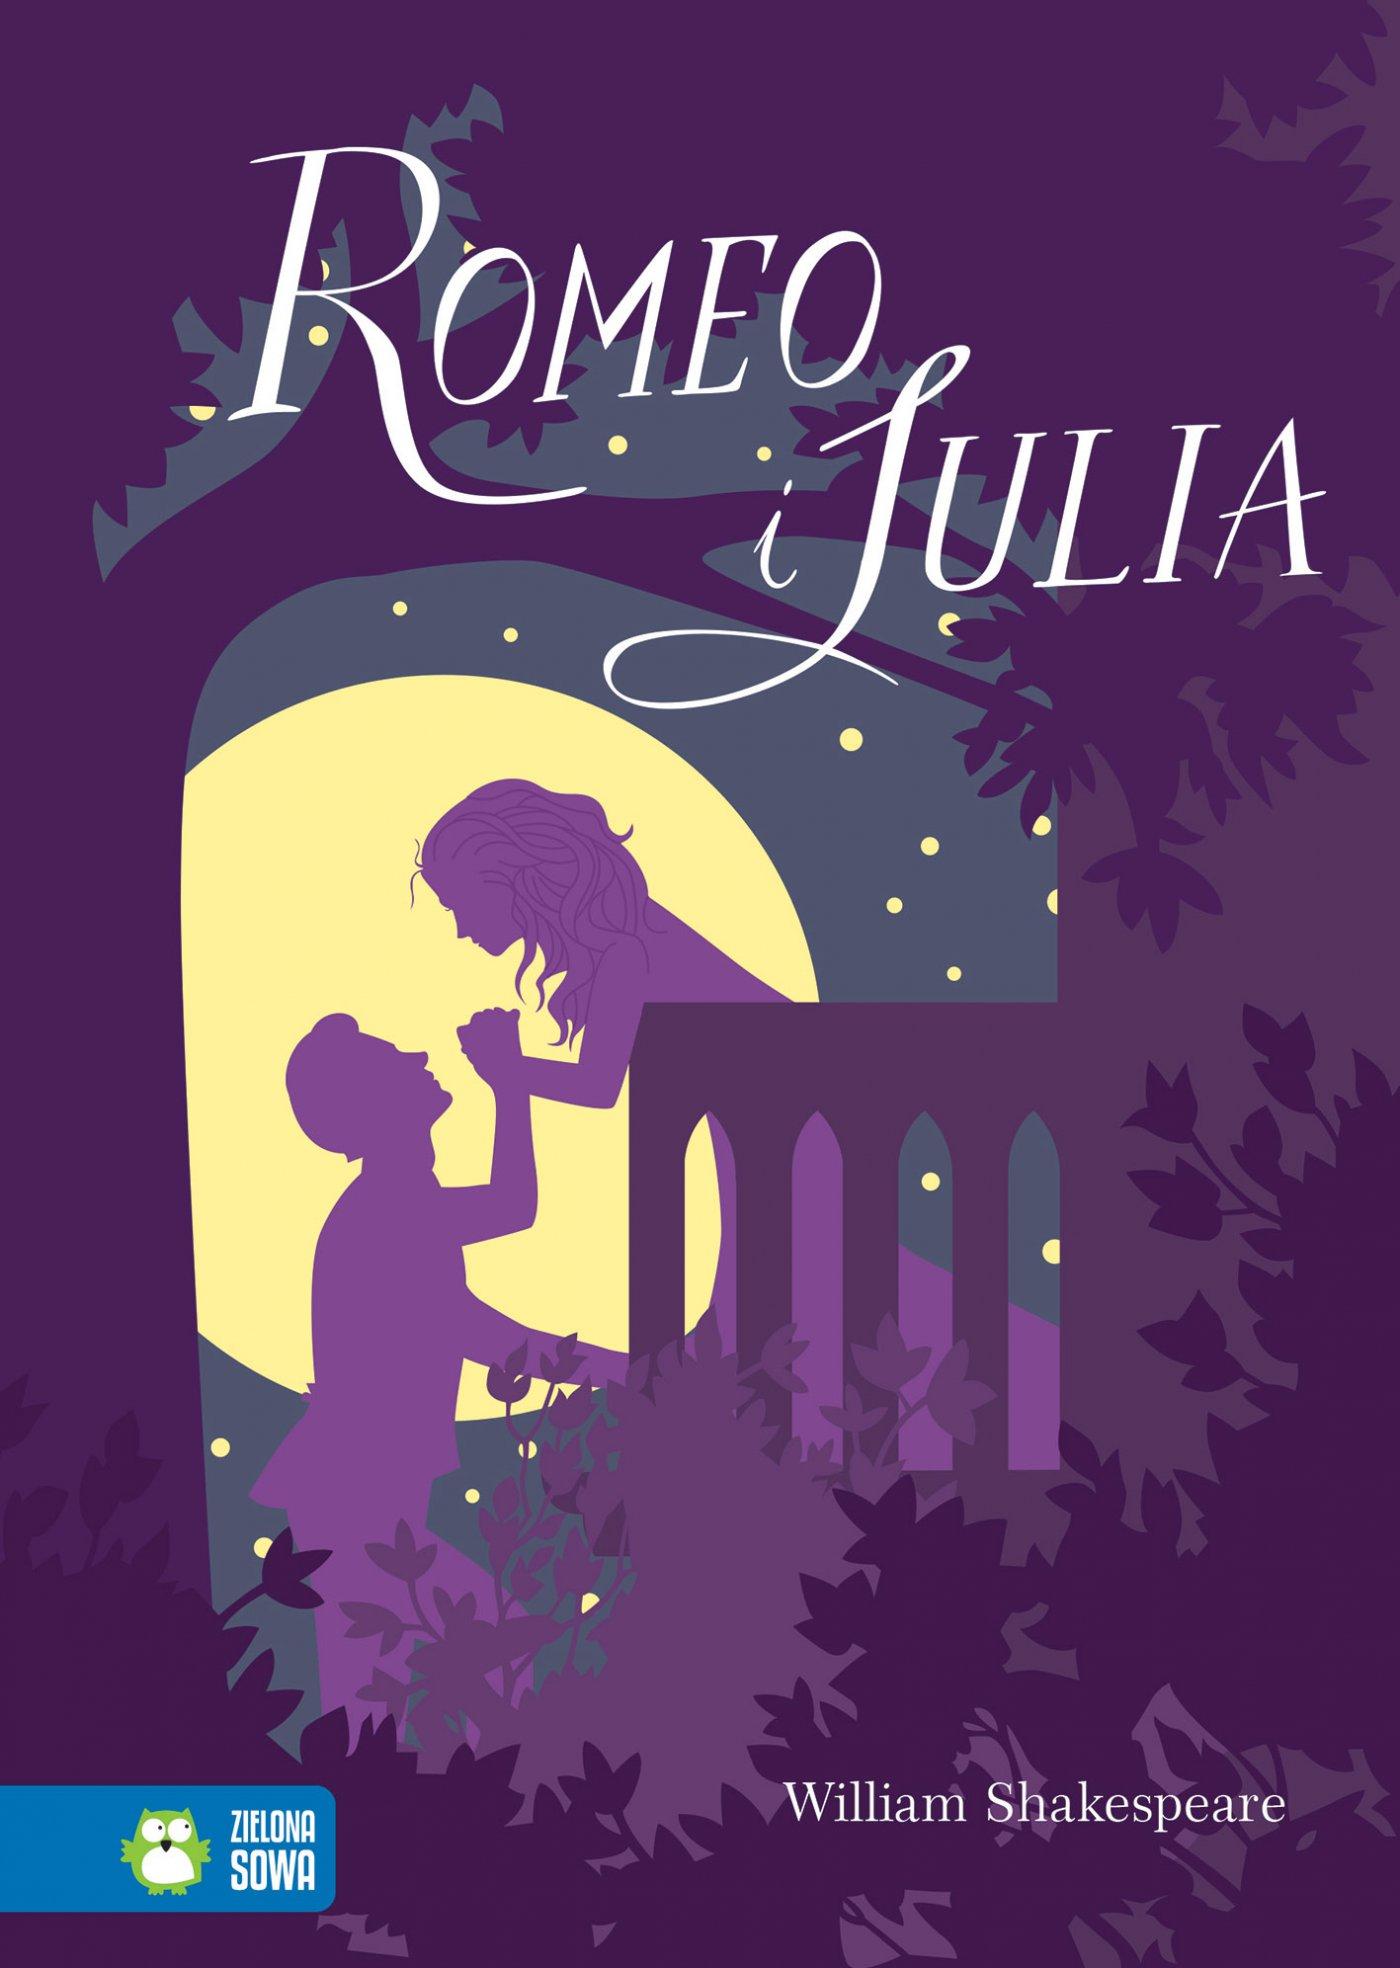 Romeo i Julia. Literatura klasyczna - Ebook (Książka EPUB) do pobrania w formacie EPUB